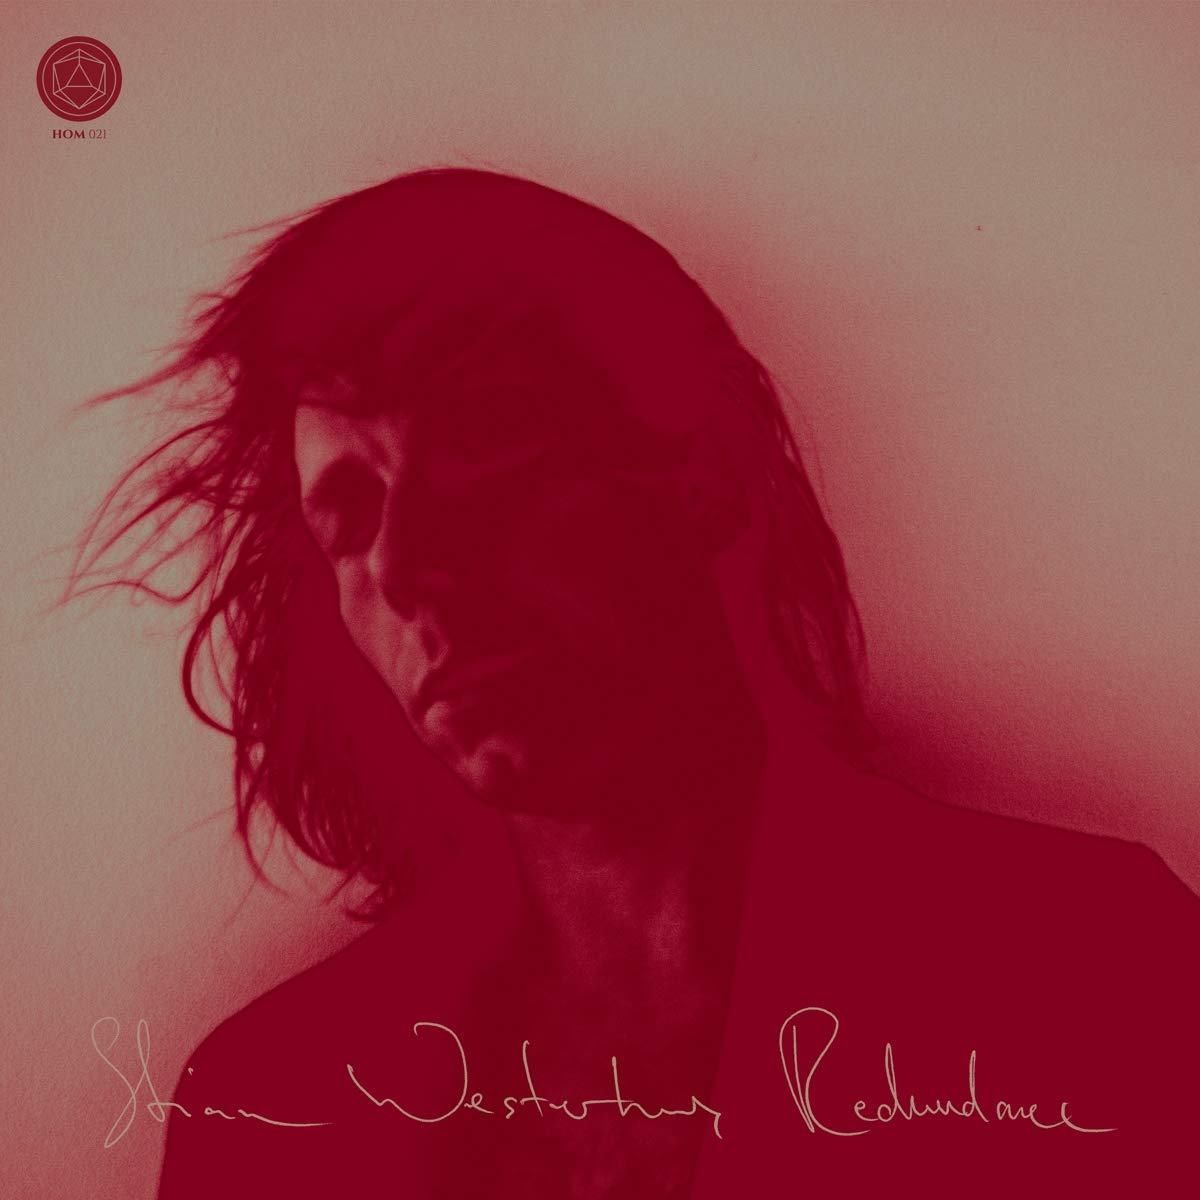 Redundance - Red Edition [Vinilo]